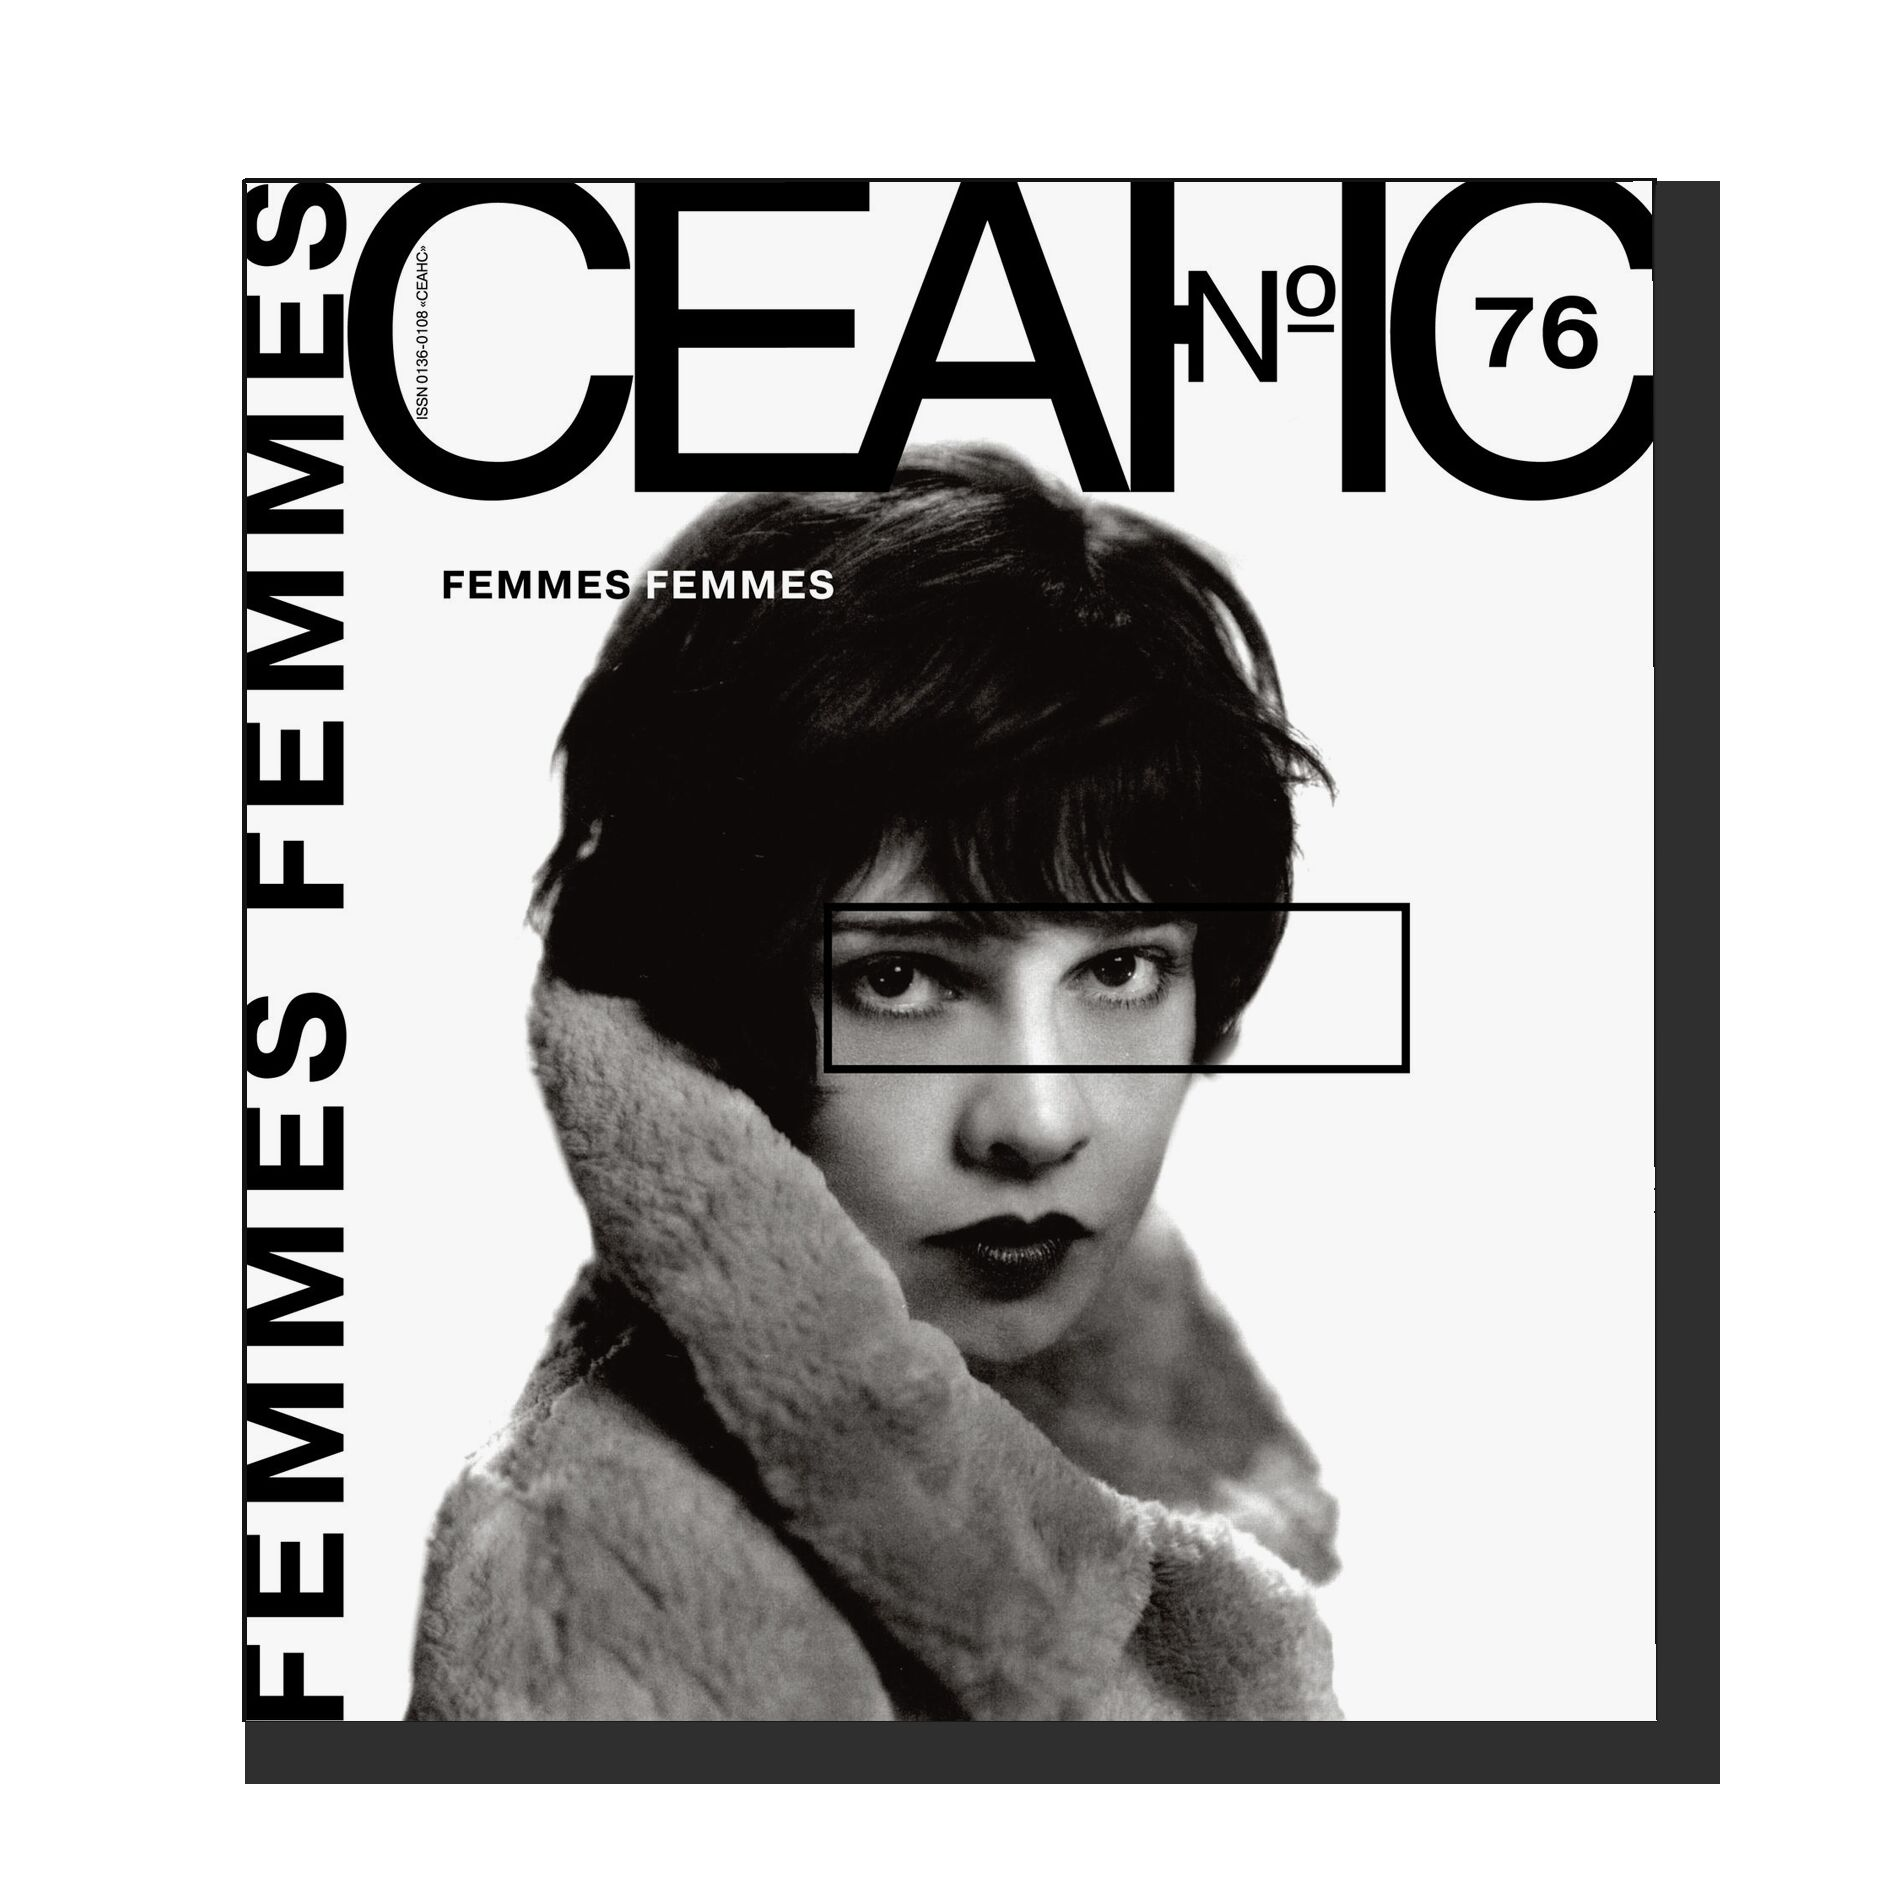 Сеанс № 76. Femmes Femmes